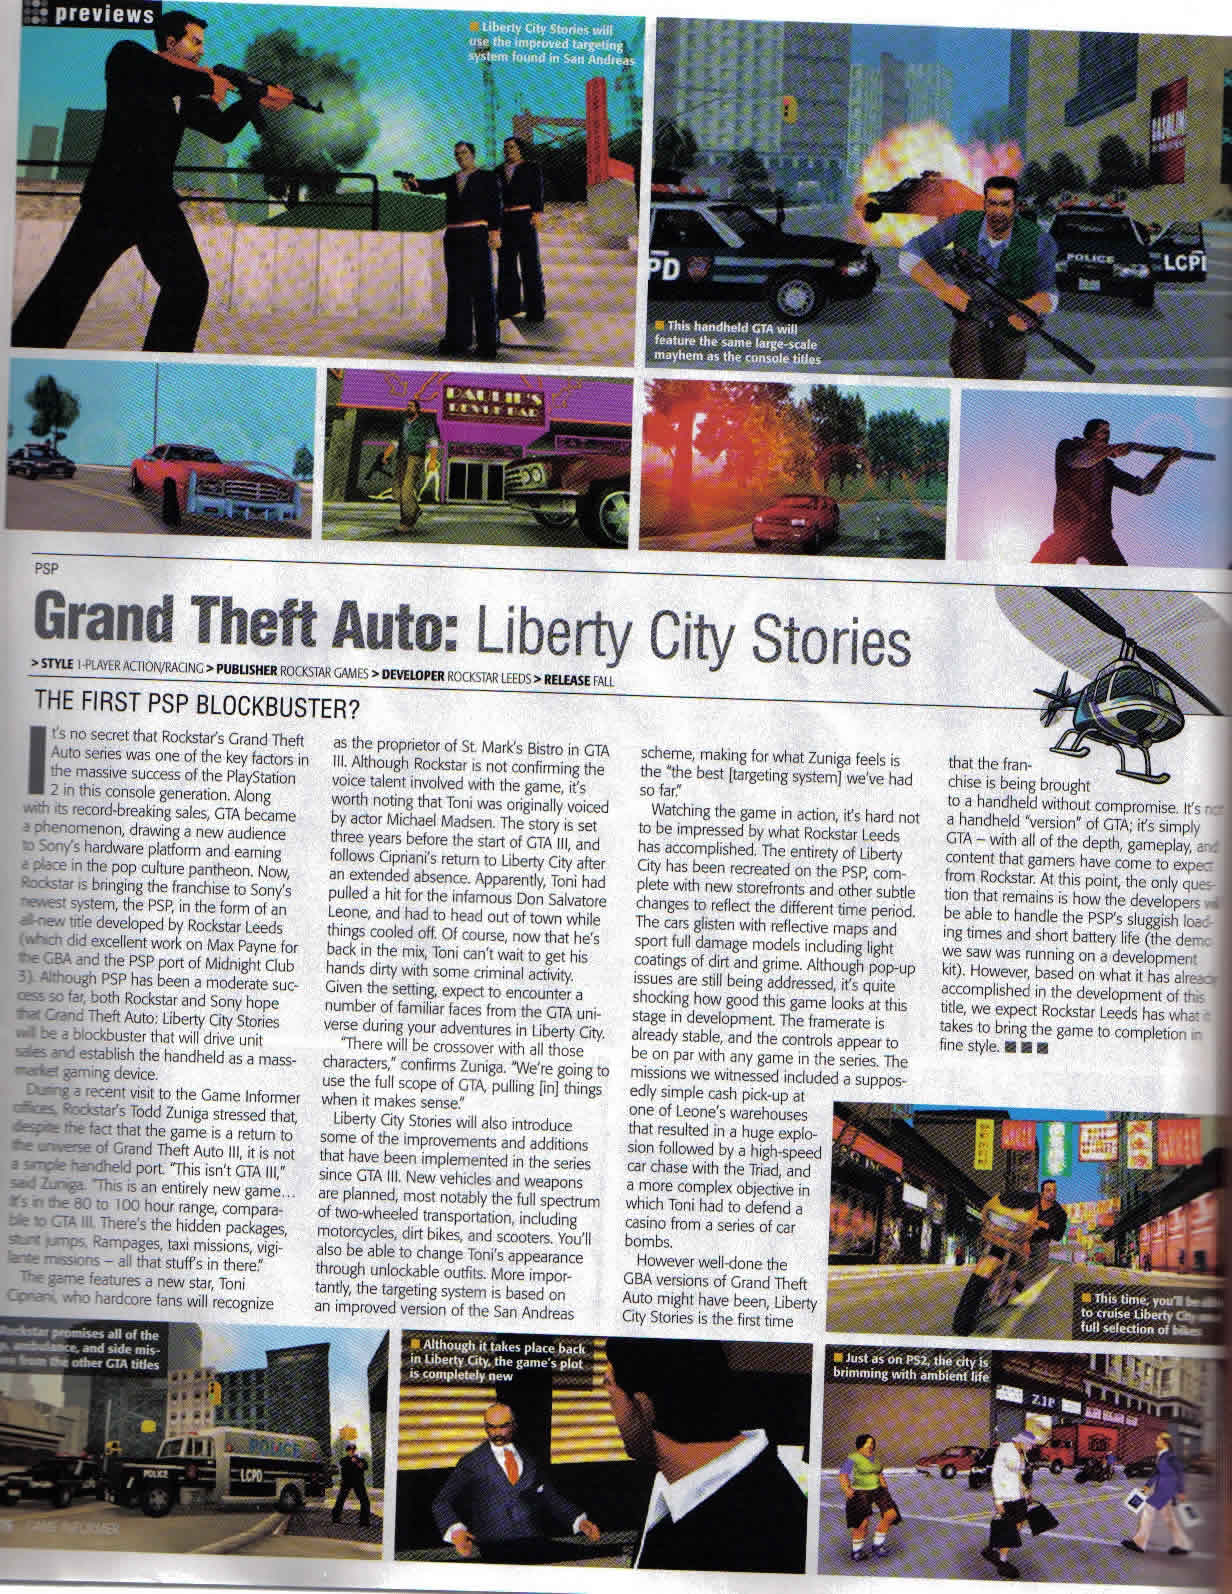 Статья про LCS - Grand Theft Auto: Liberty City Stories